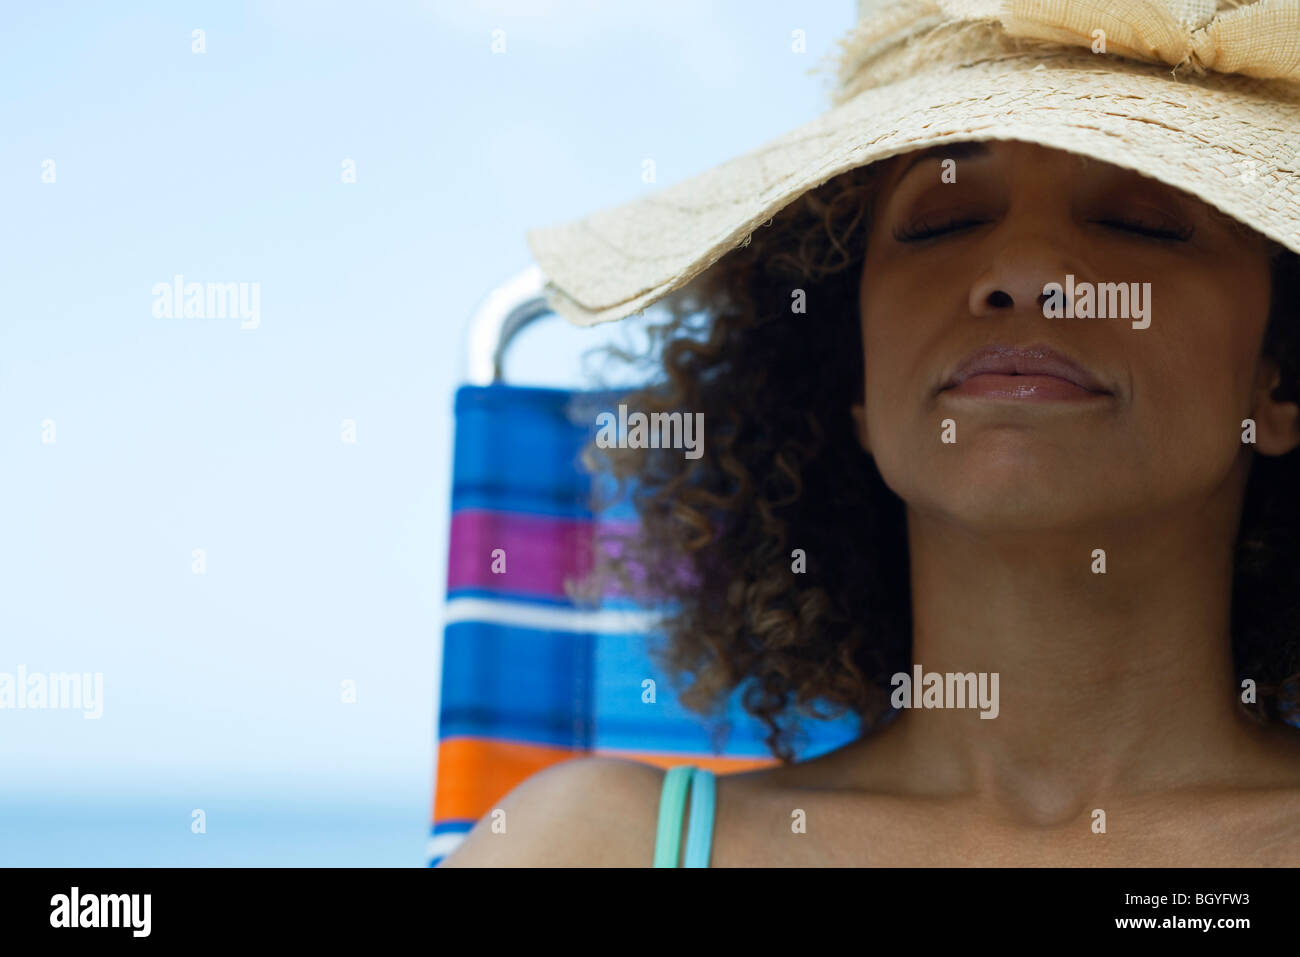 Woman sunbathing on deckchair, wearing sun hat - Stock Image